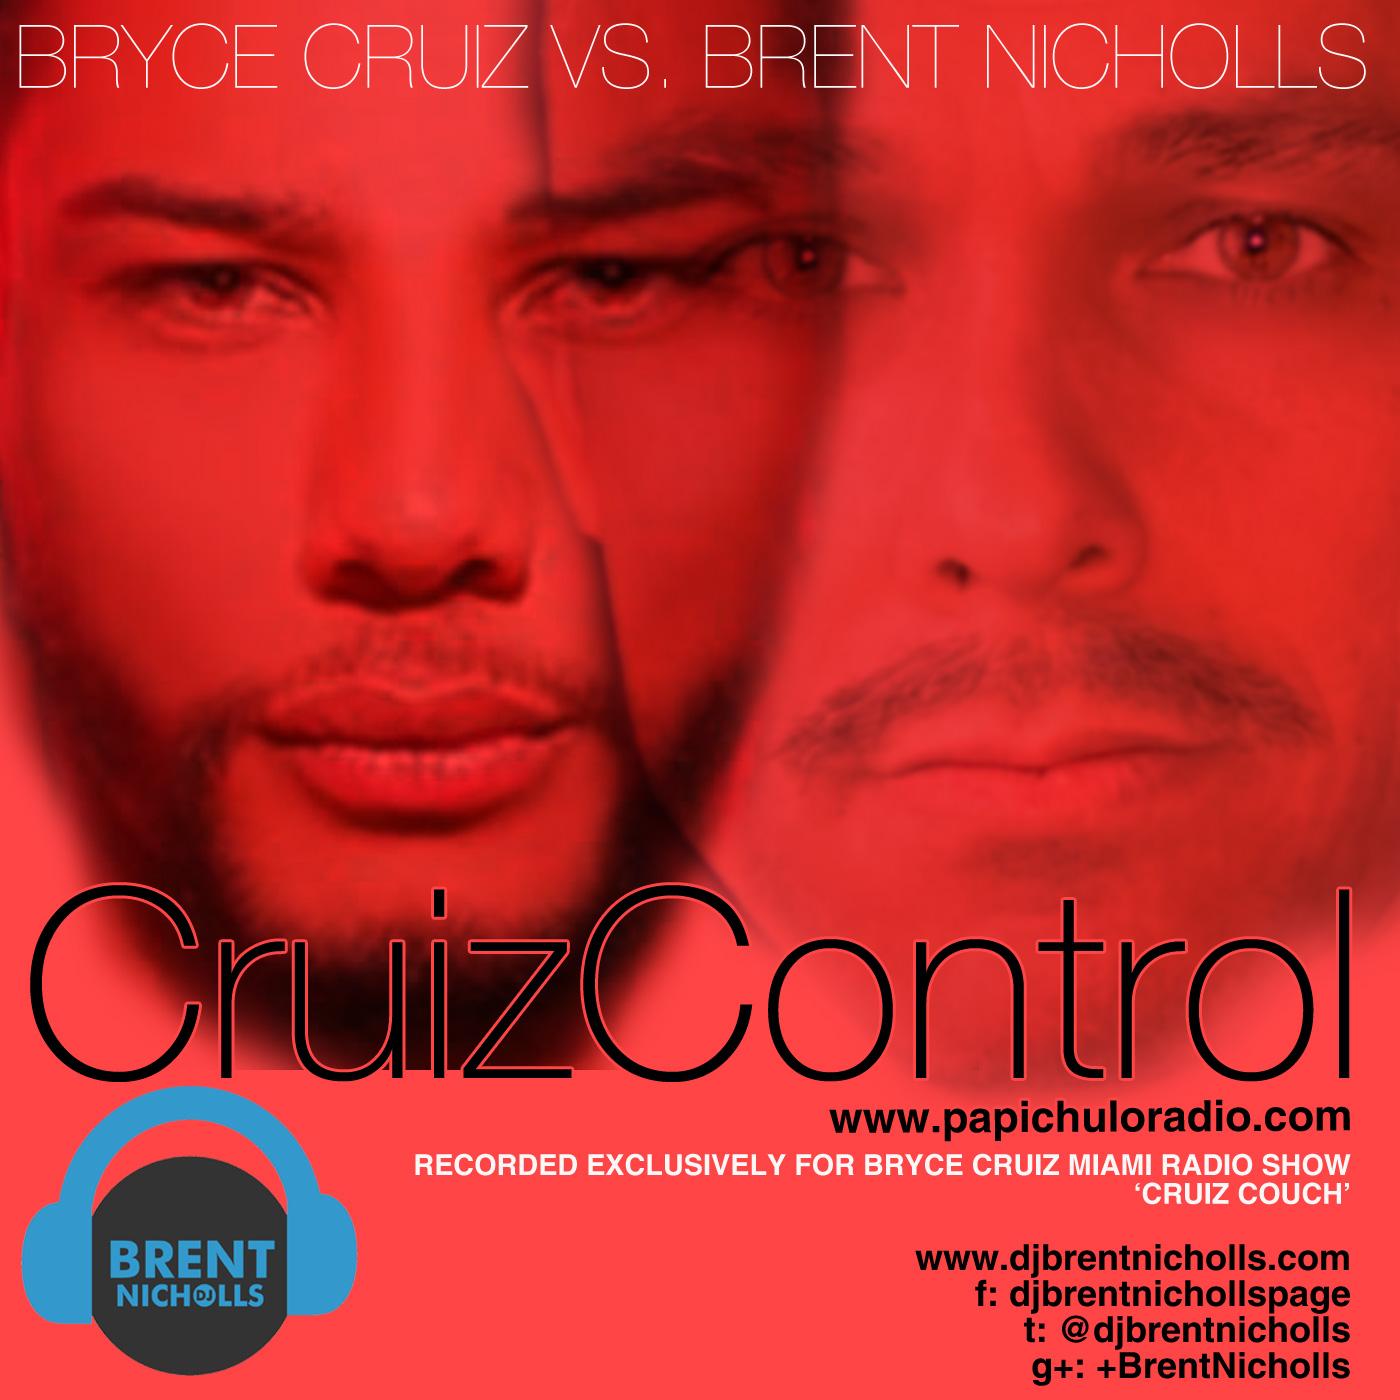 PODCAST: CRUIZ CONTROL